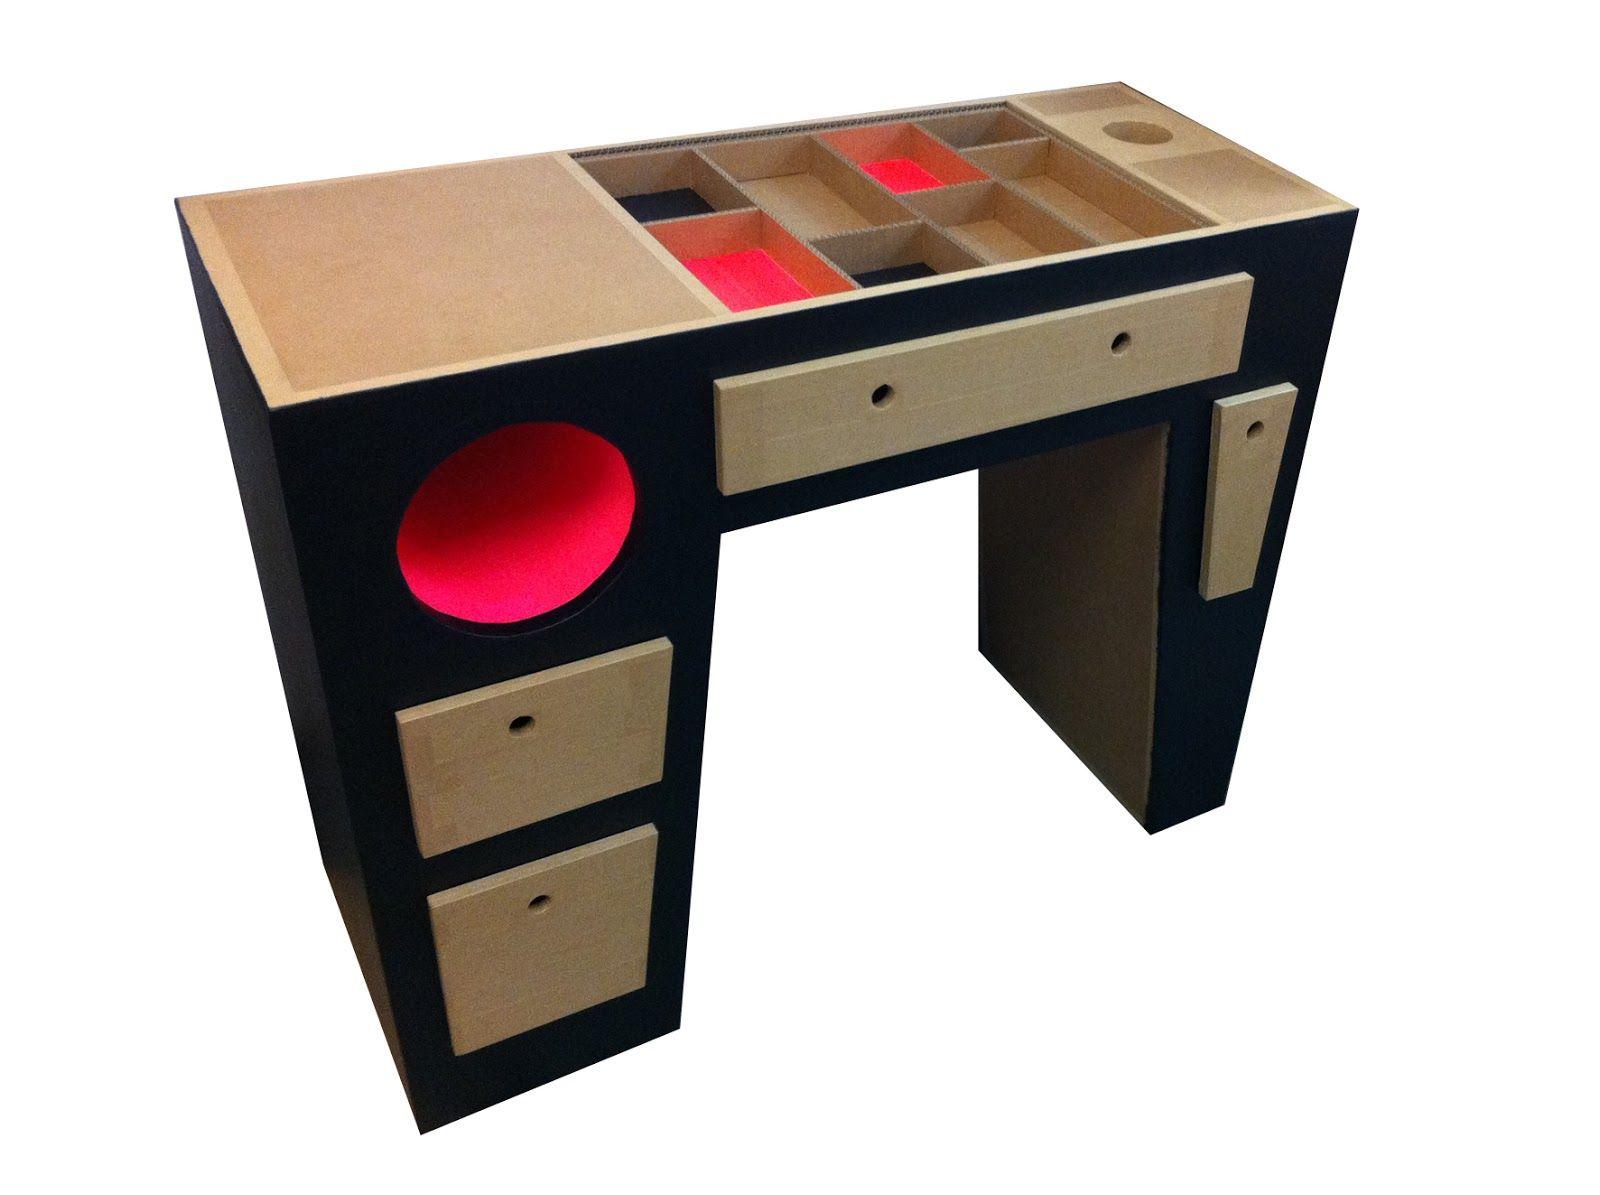 bureau en carton cardboard carton in 2018 pinterest cardboard furniture. Black Bedroom Furniture Sets. Home Design Ideas